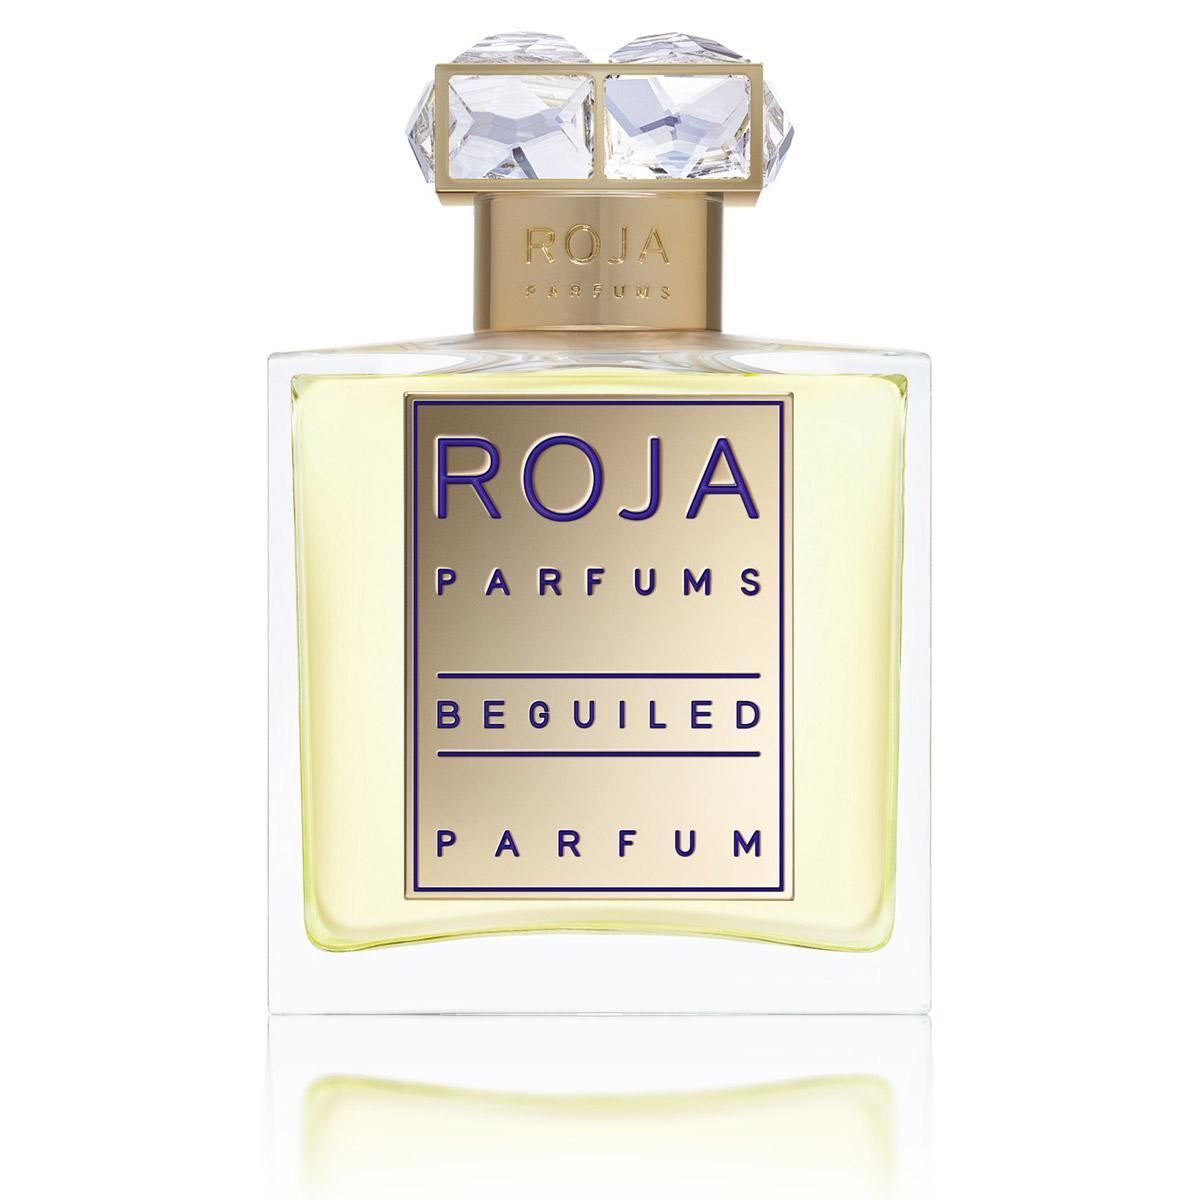 BEGUILED by ROJA DOVE 5ml Travel Spray Oakmoss Rose Jasmin Iris Pepper Perfume